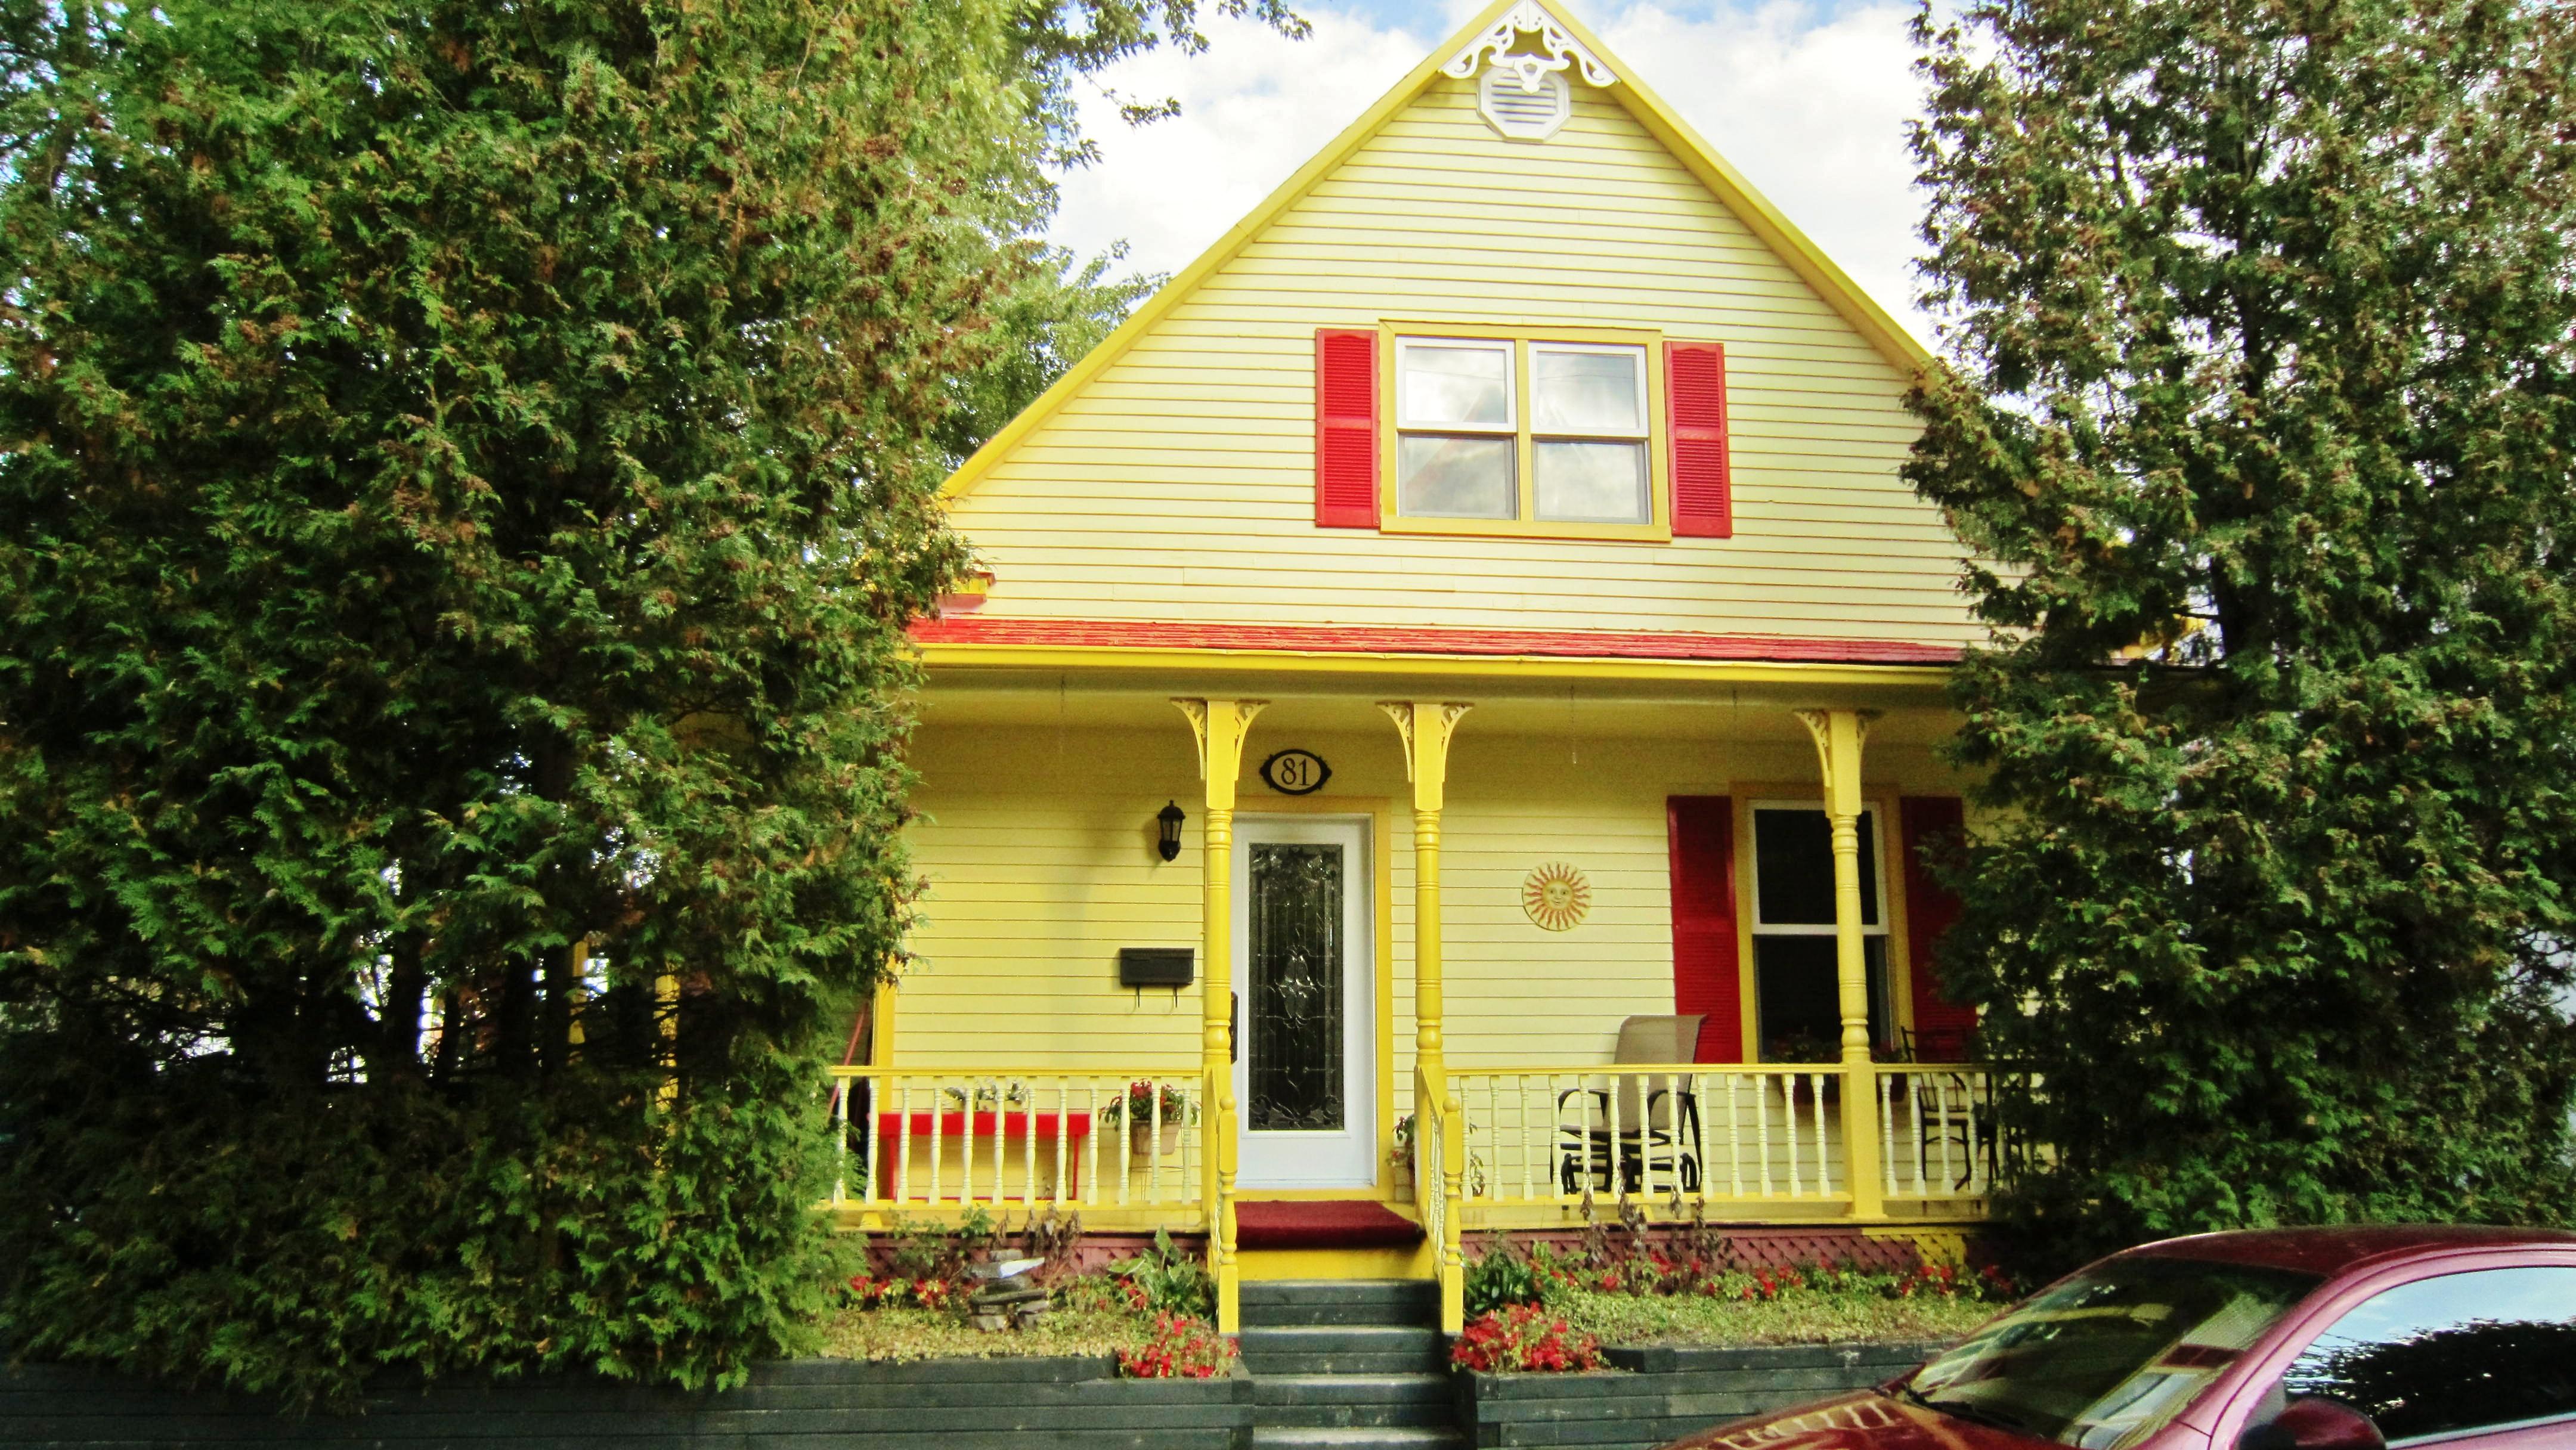 File:Belle petite maison de Terrebonne, Québec, Canada - panoramio ...